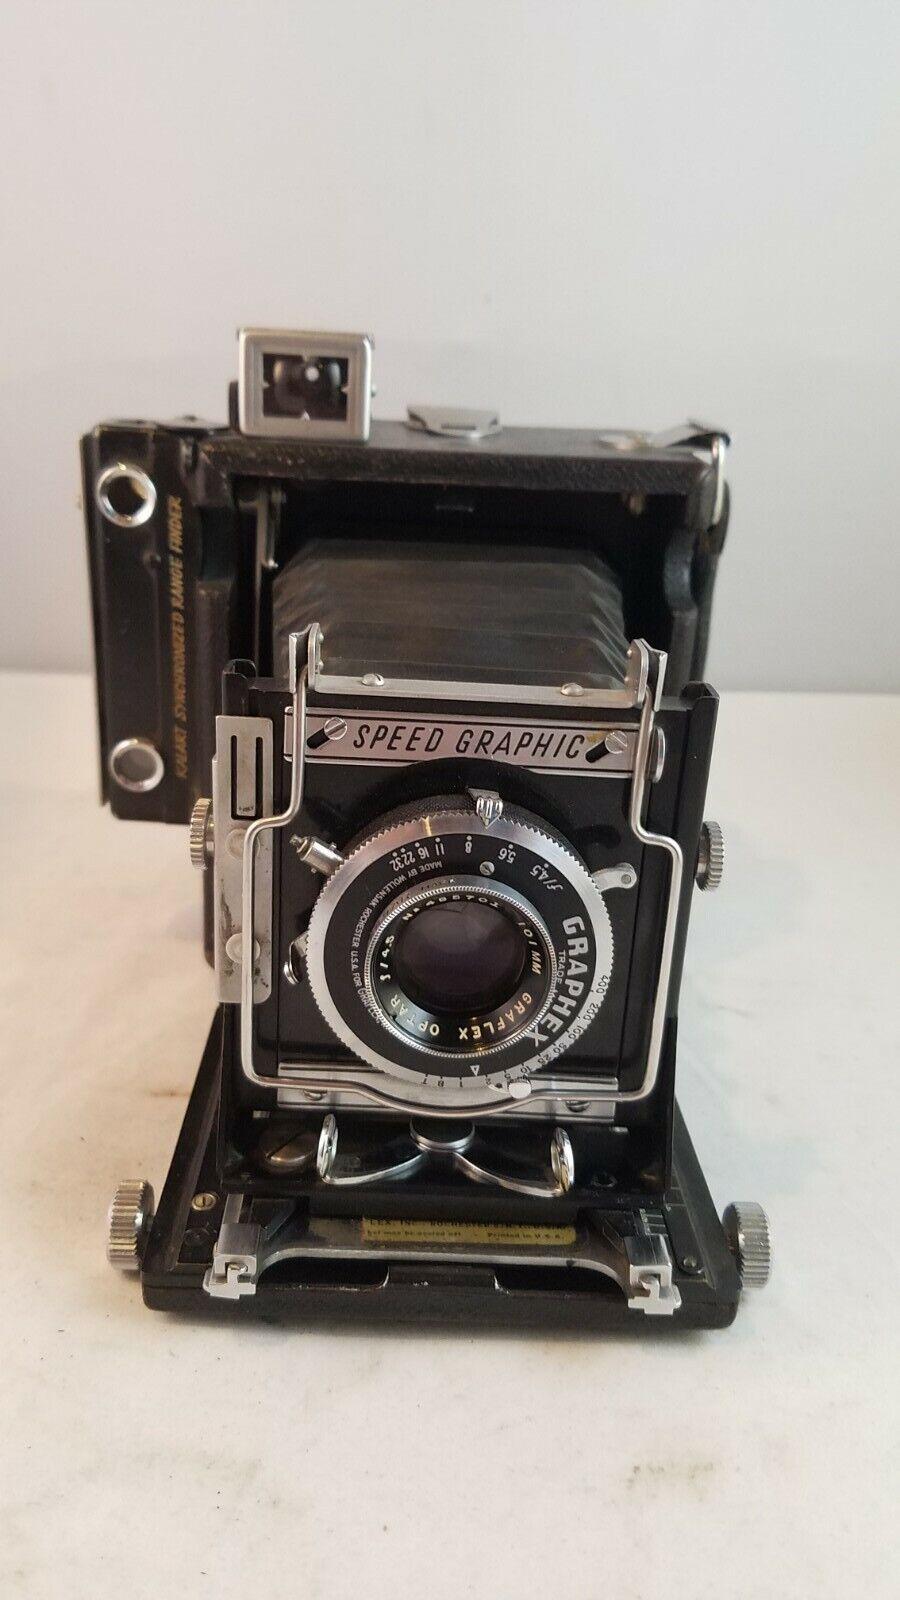 Vintage Graflex Speed Graphic Camera - $250.00